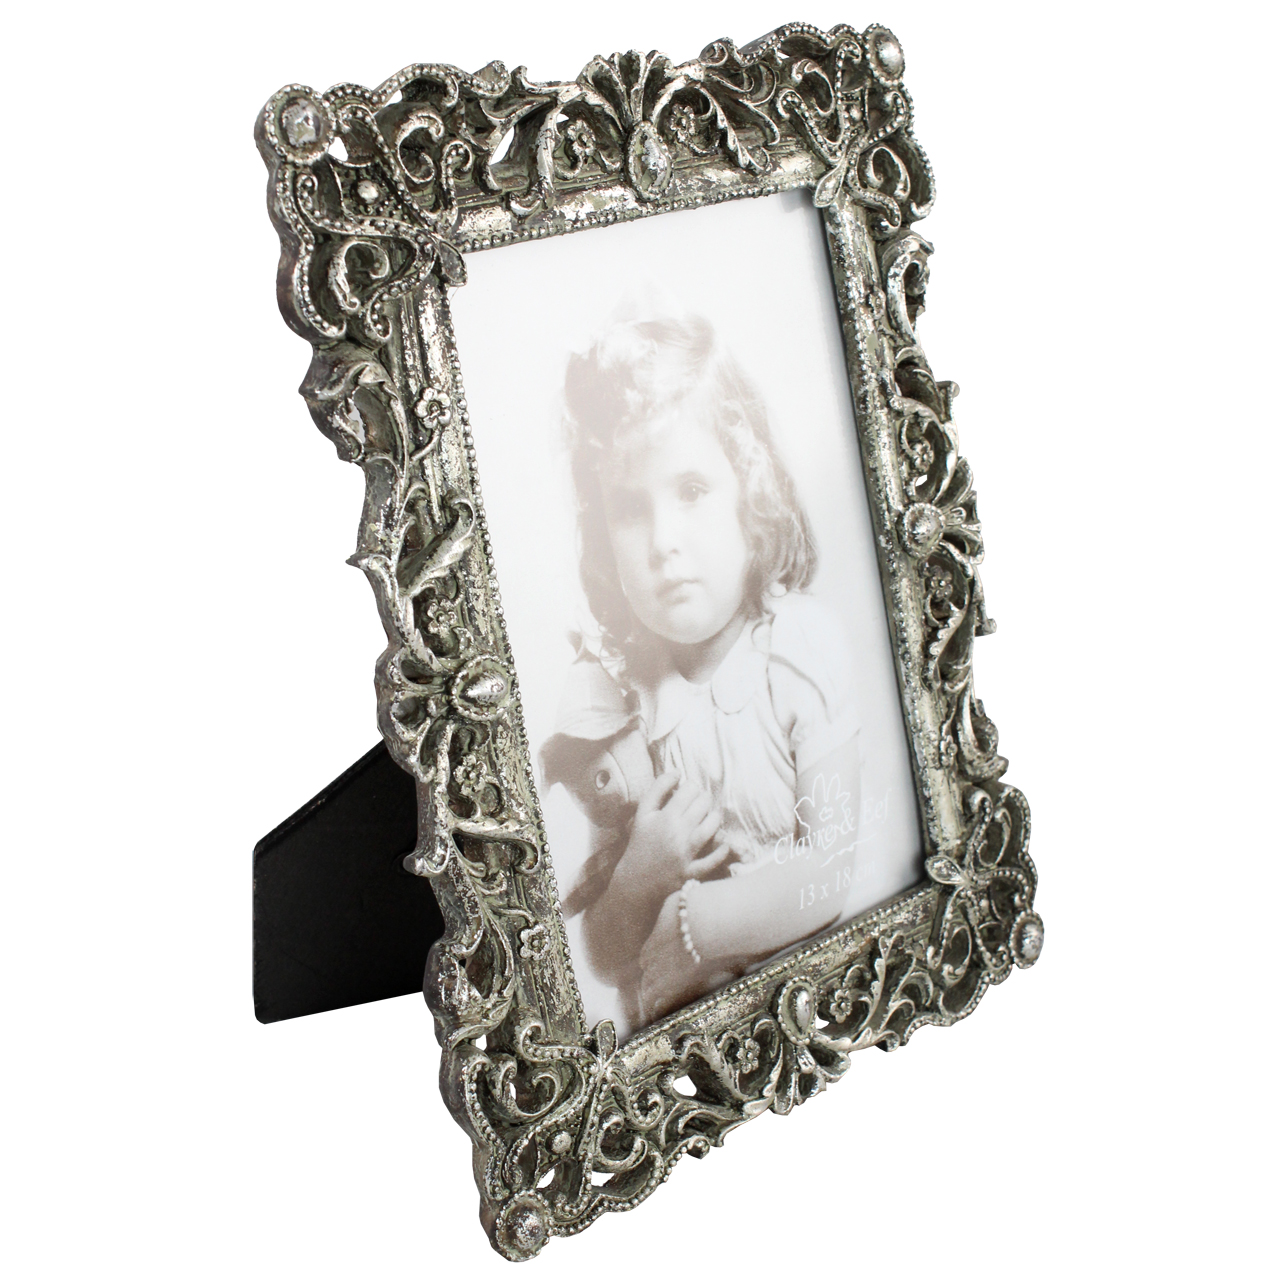 Rama Foto Dreptunghiulara Din Metal Argintiu 24x18